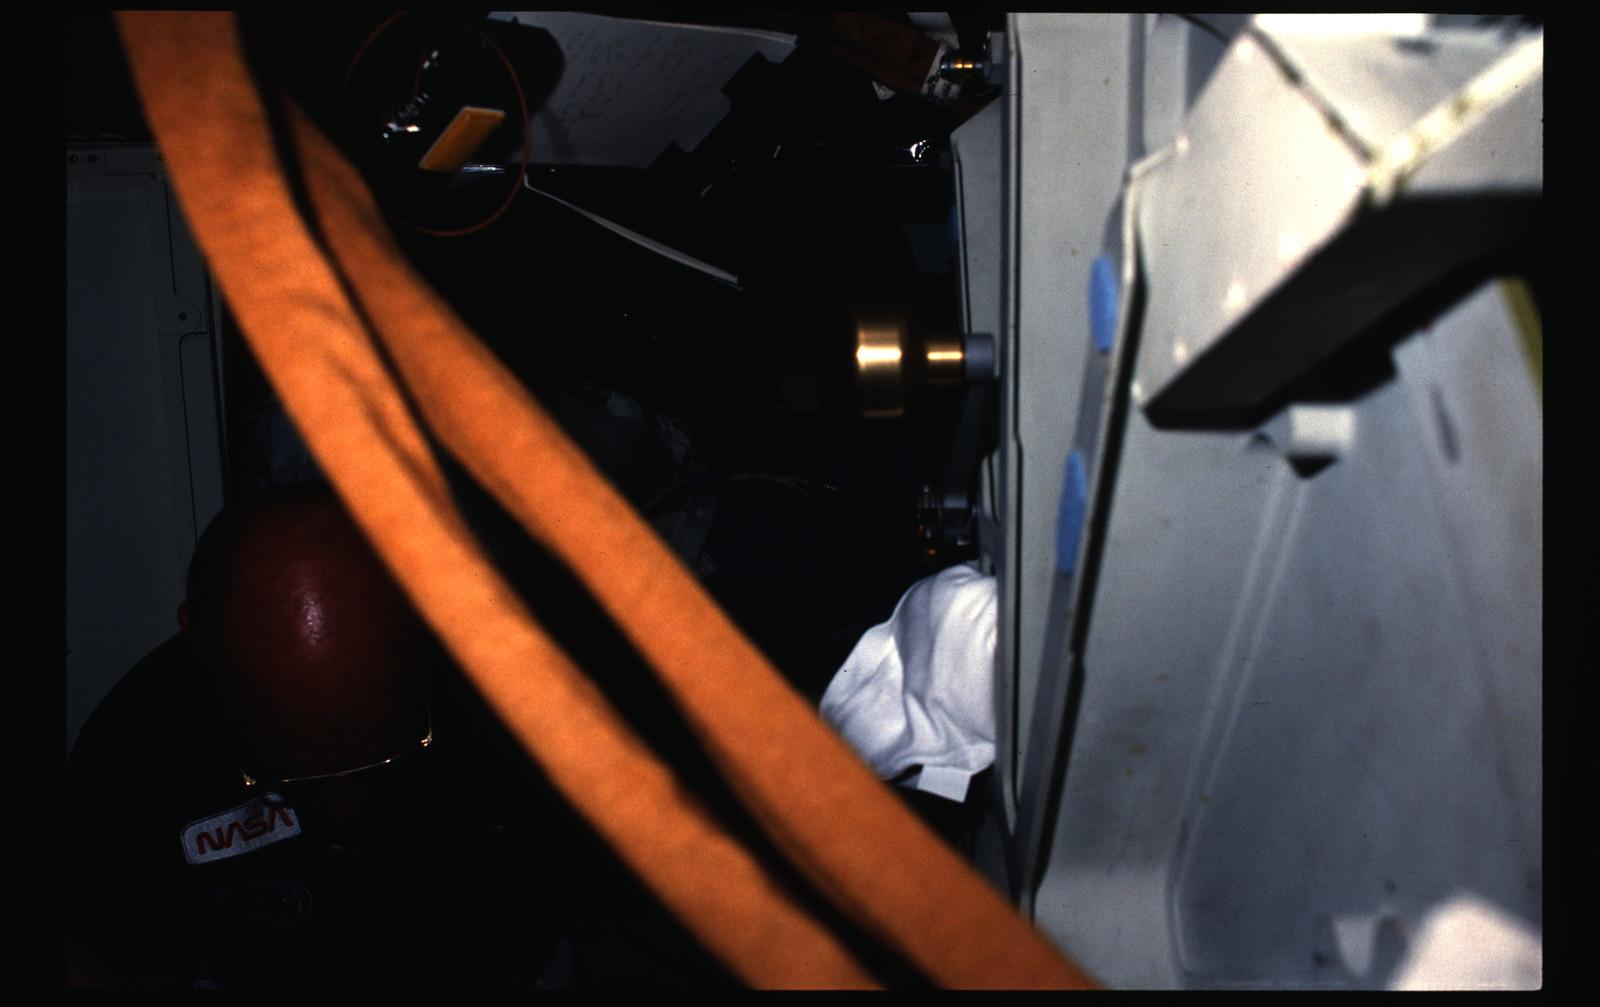 51B-05-009 - STS-51B - 51B crew activities